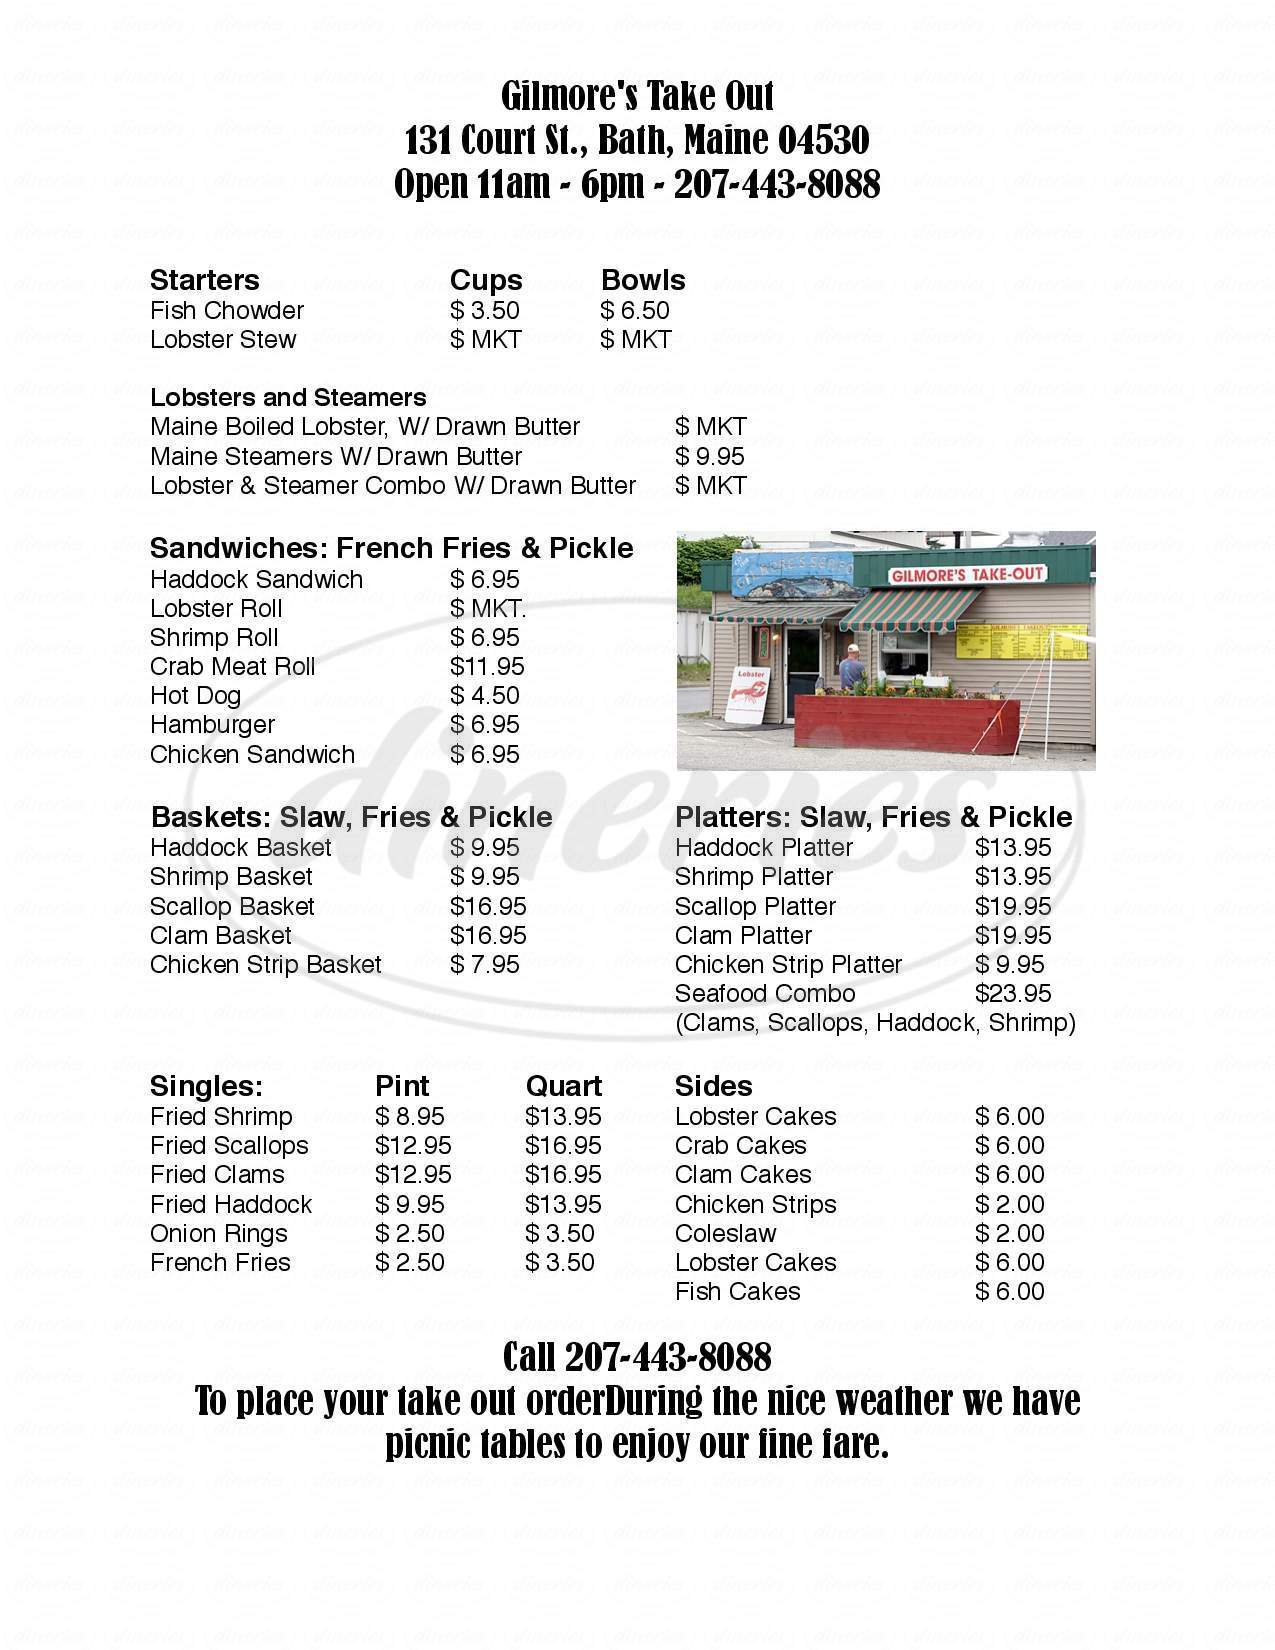 menu for Gilmores Take-Out